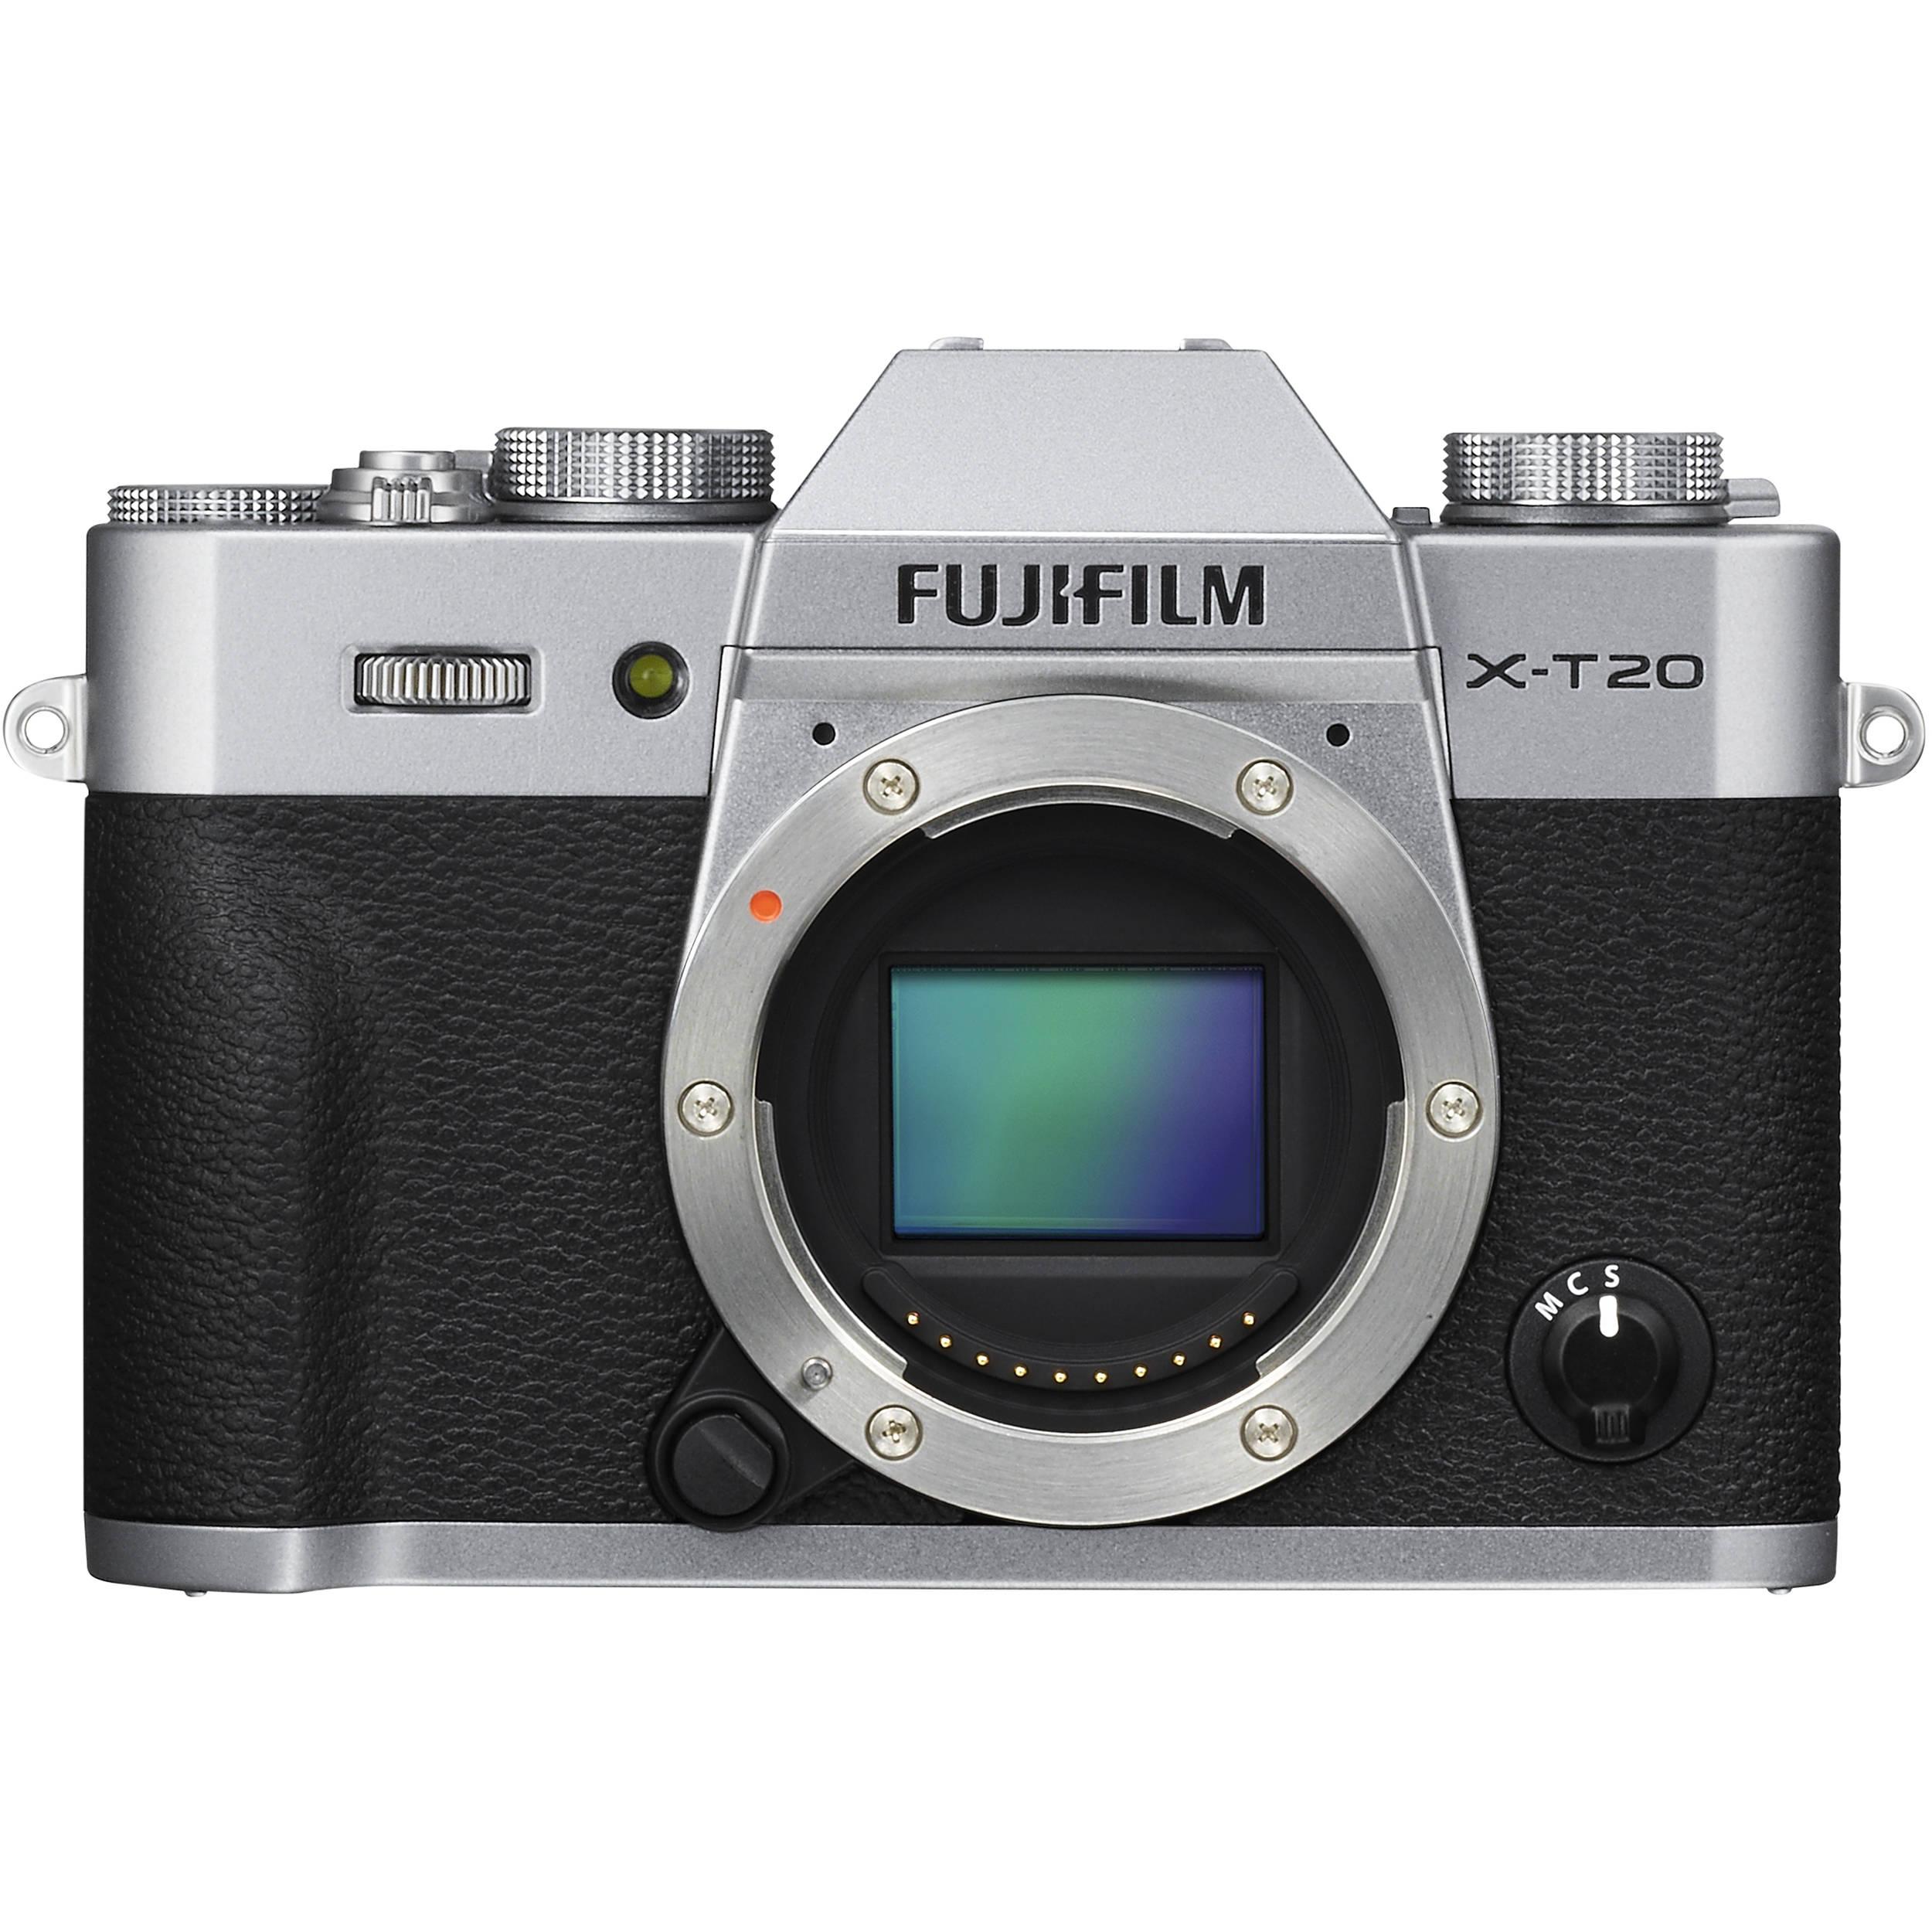 Fujifilm X T20 Mirrorless Digital Camera 16542359 Bh Photo T2 Body Black Only Silver